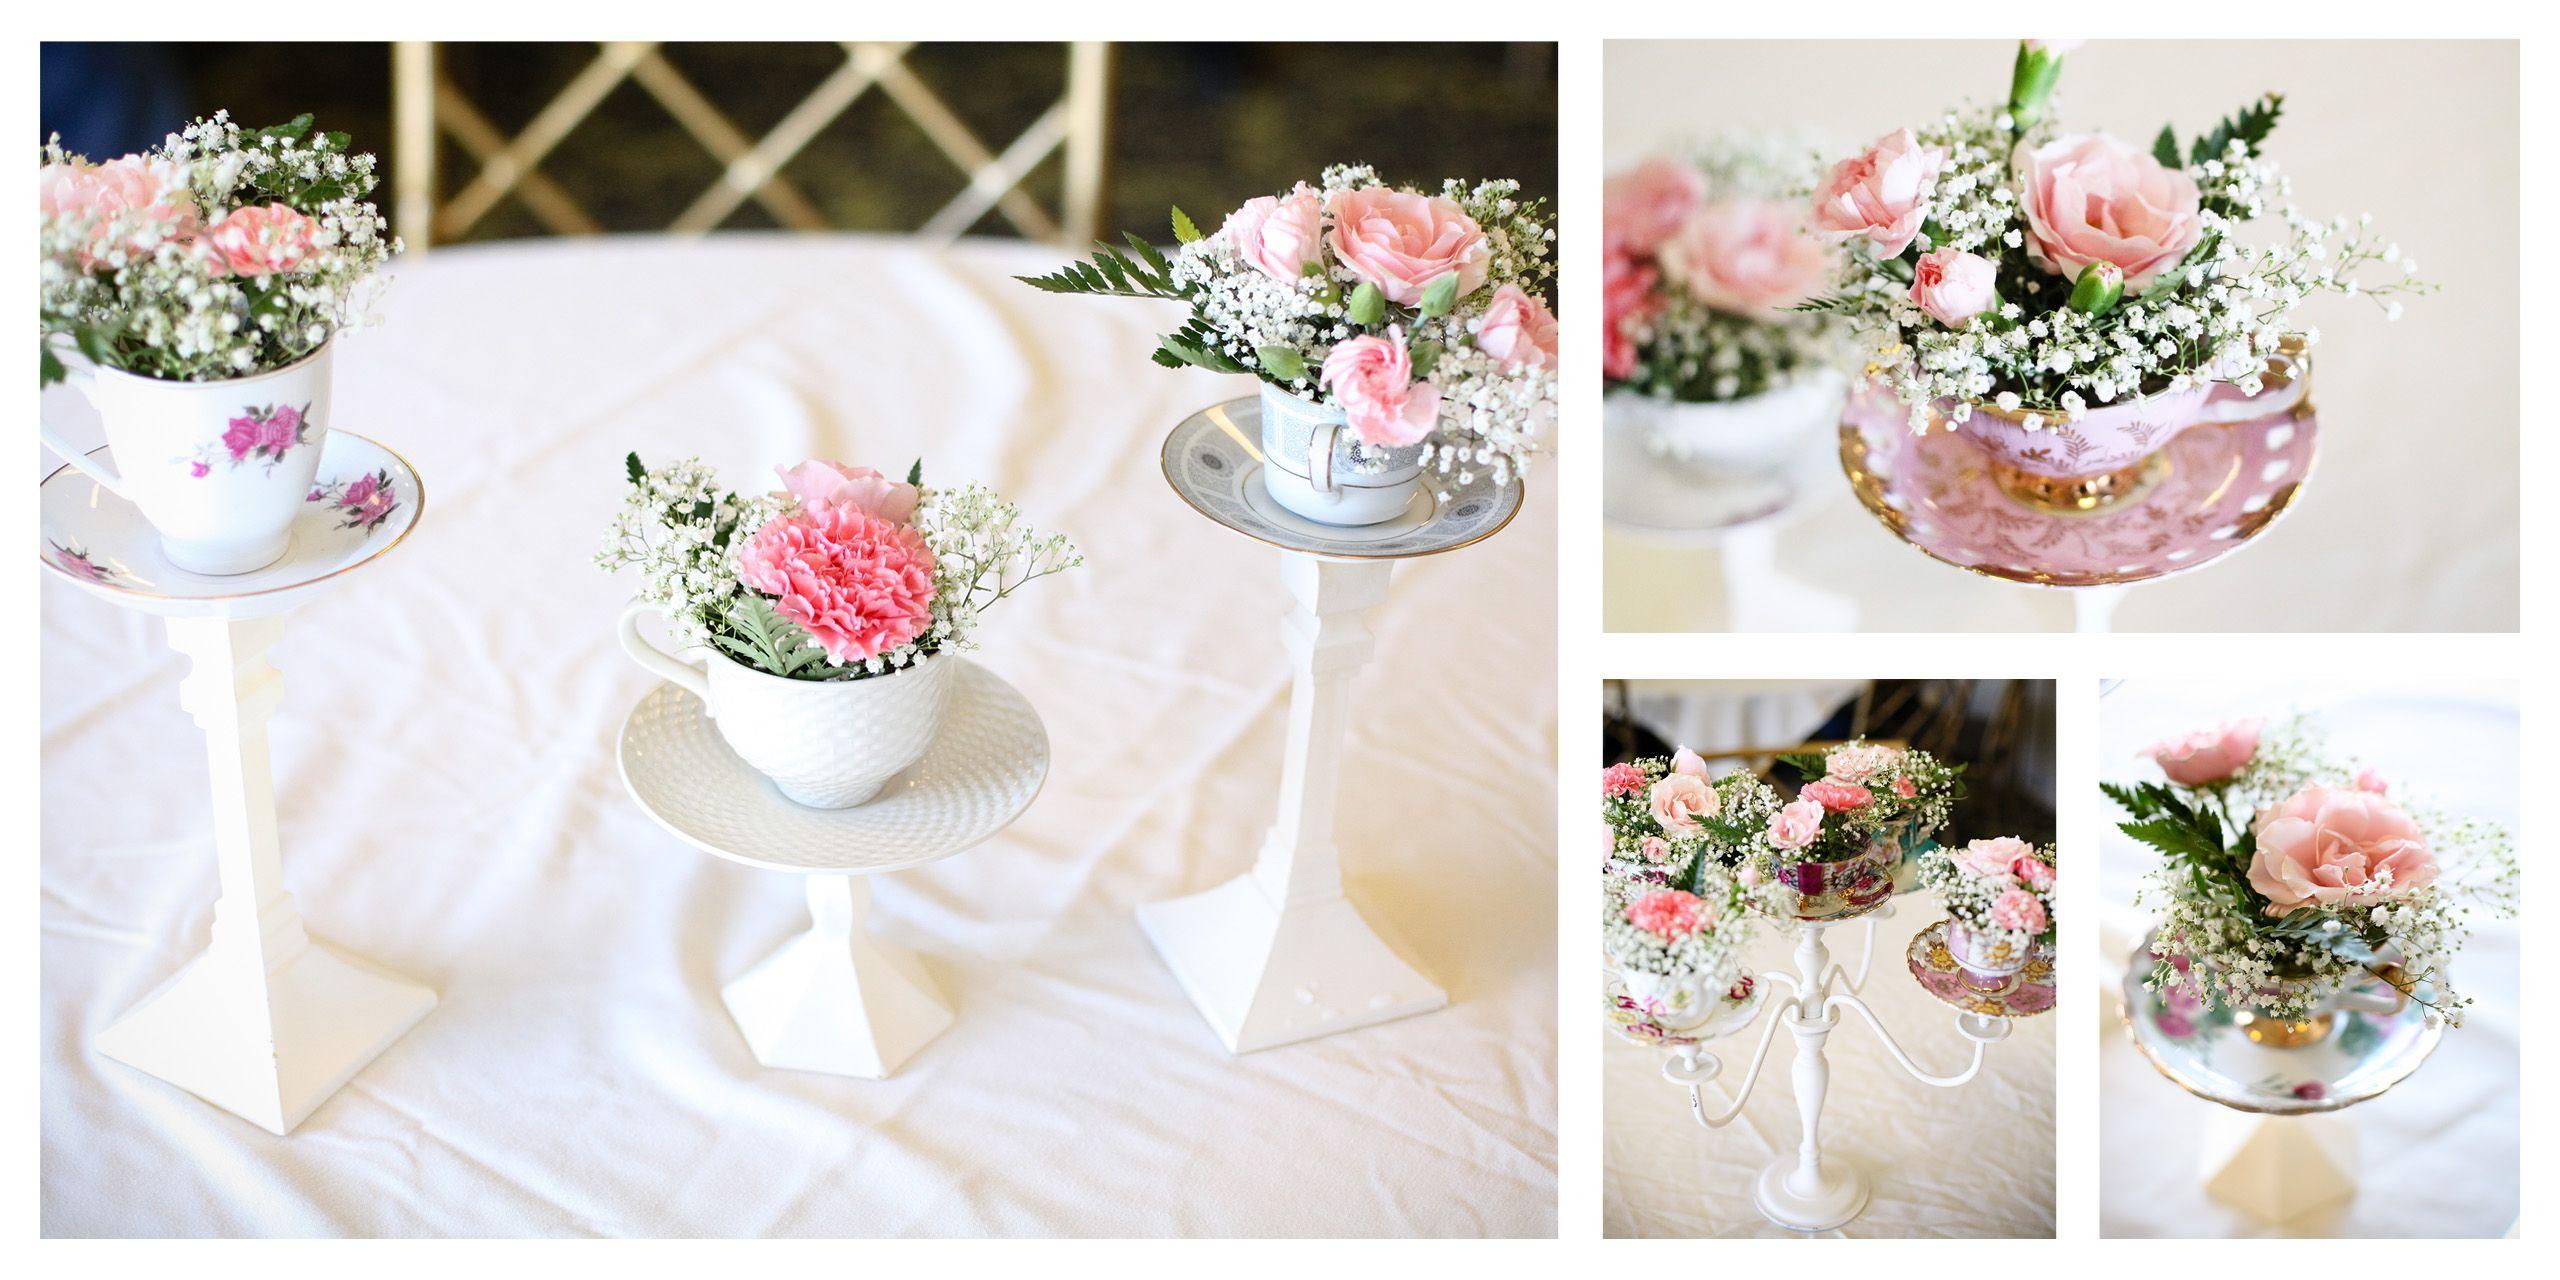 Sidney\'s 1st birthday. Tea cup centerpieces   Bridal Shower ...